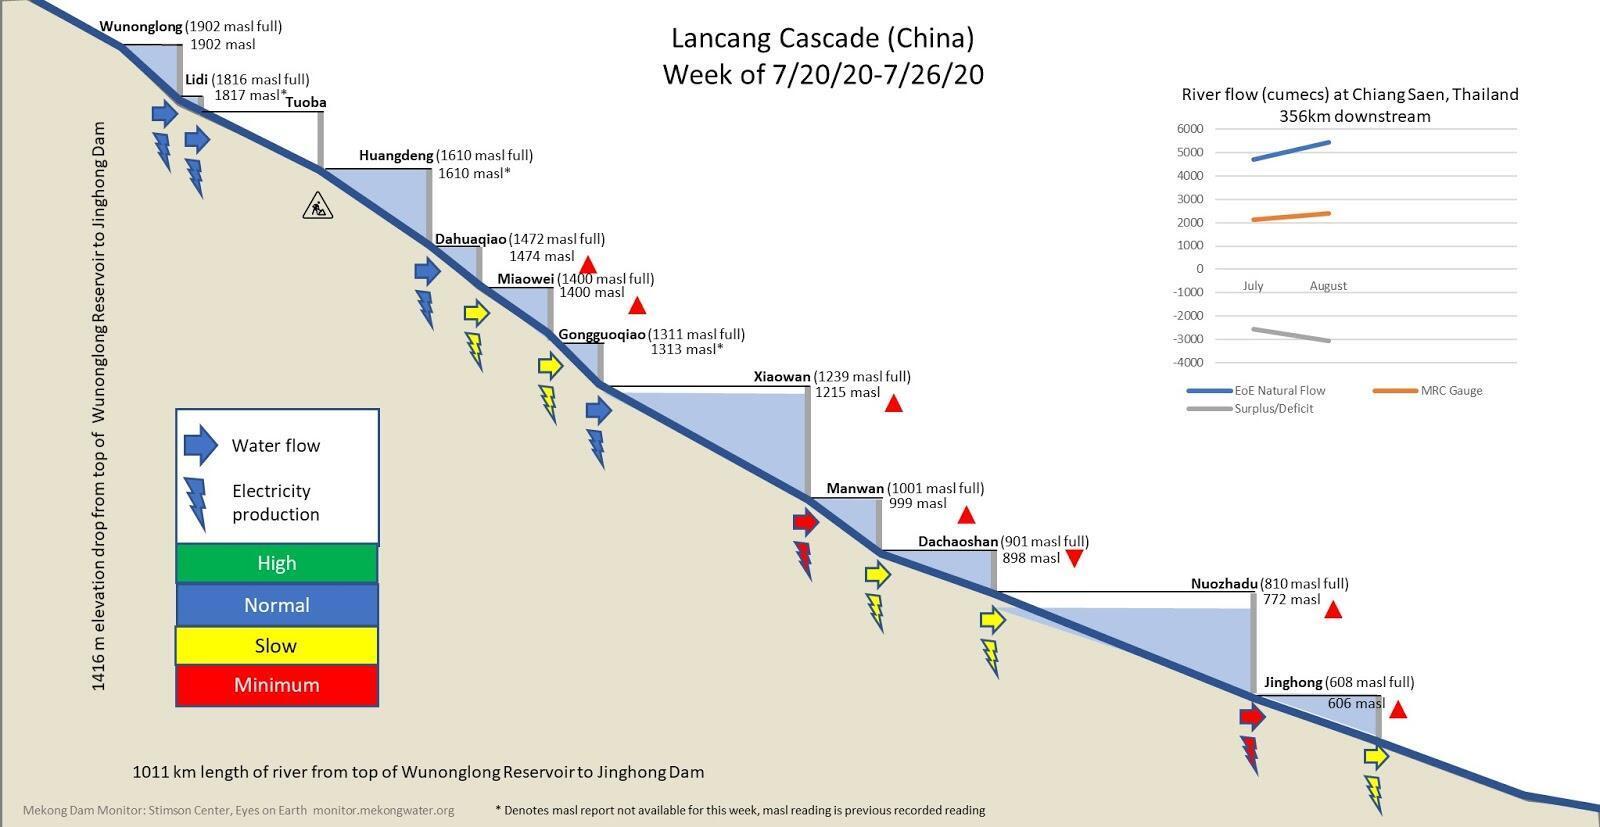 MEKONG_MDM  :Illustrative example of Lancang Cascade analysis from week of 7/20/2020-7/26/2020.